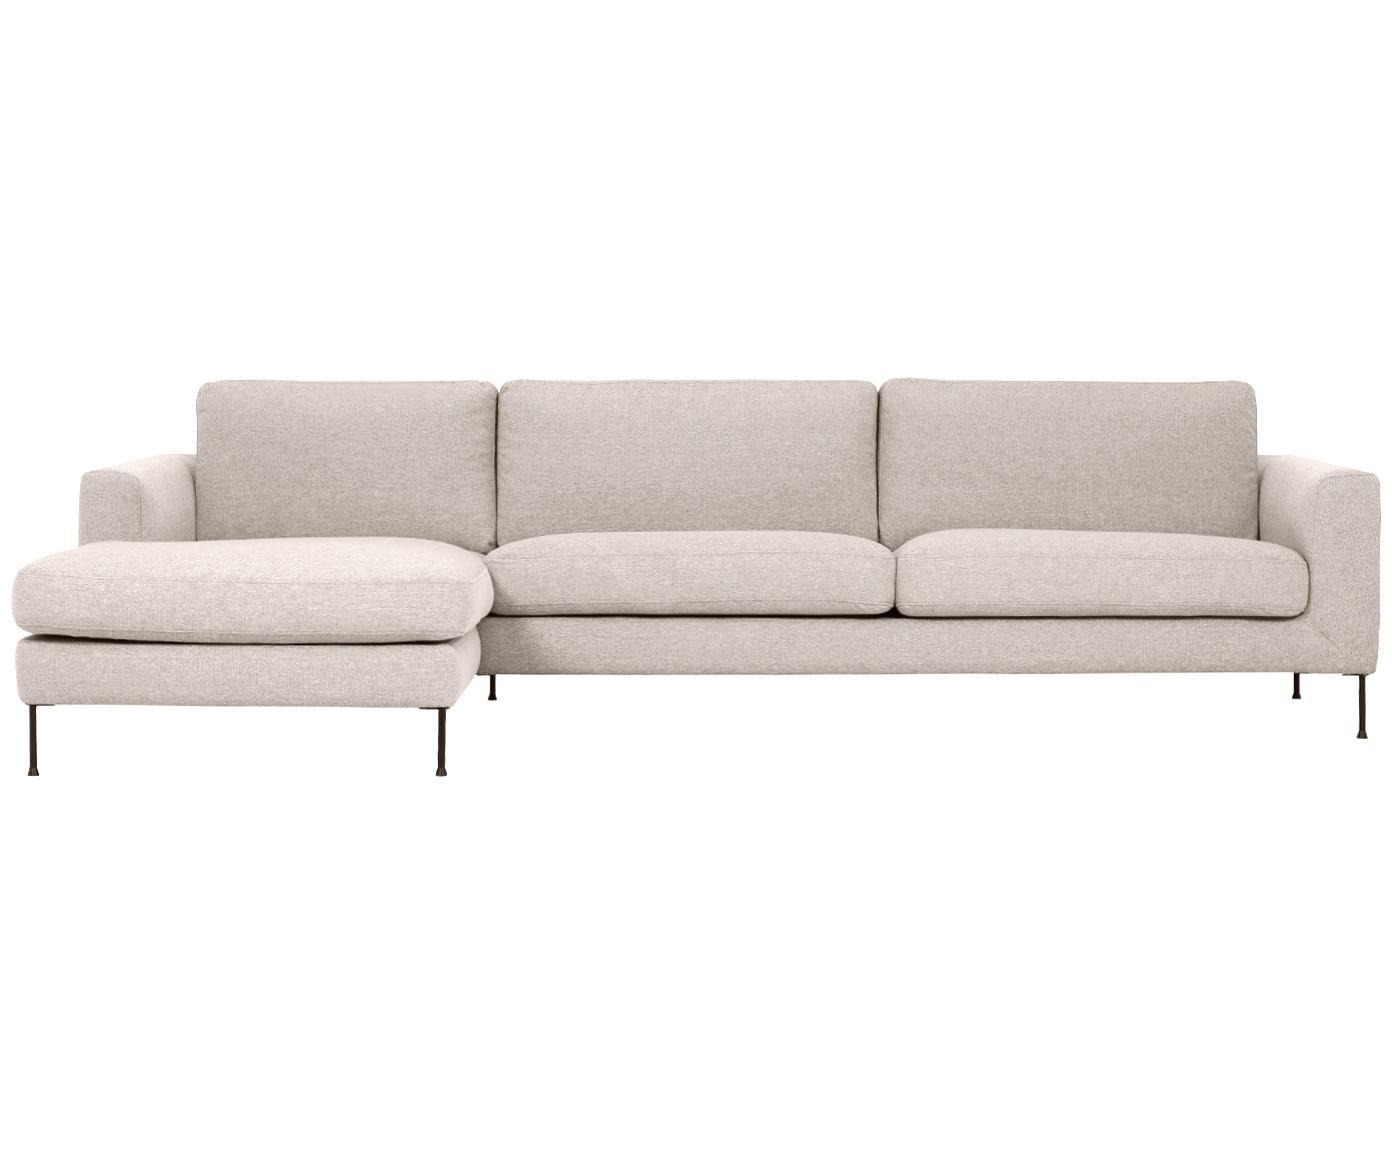 Ecksofa Cucita (4-Sitzer), Bezug: Webstoff (Polyester) 100., Gestell: Massives Kiefernholz, Webstoff Beige, B 302 x T 163 cm